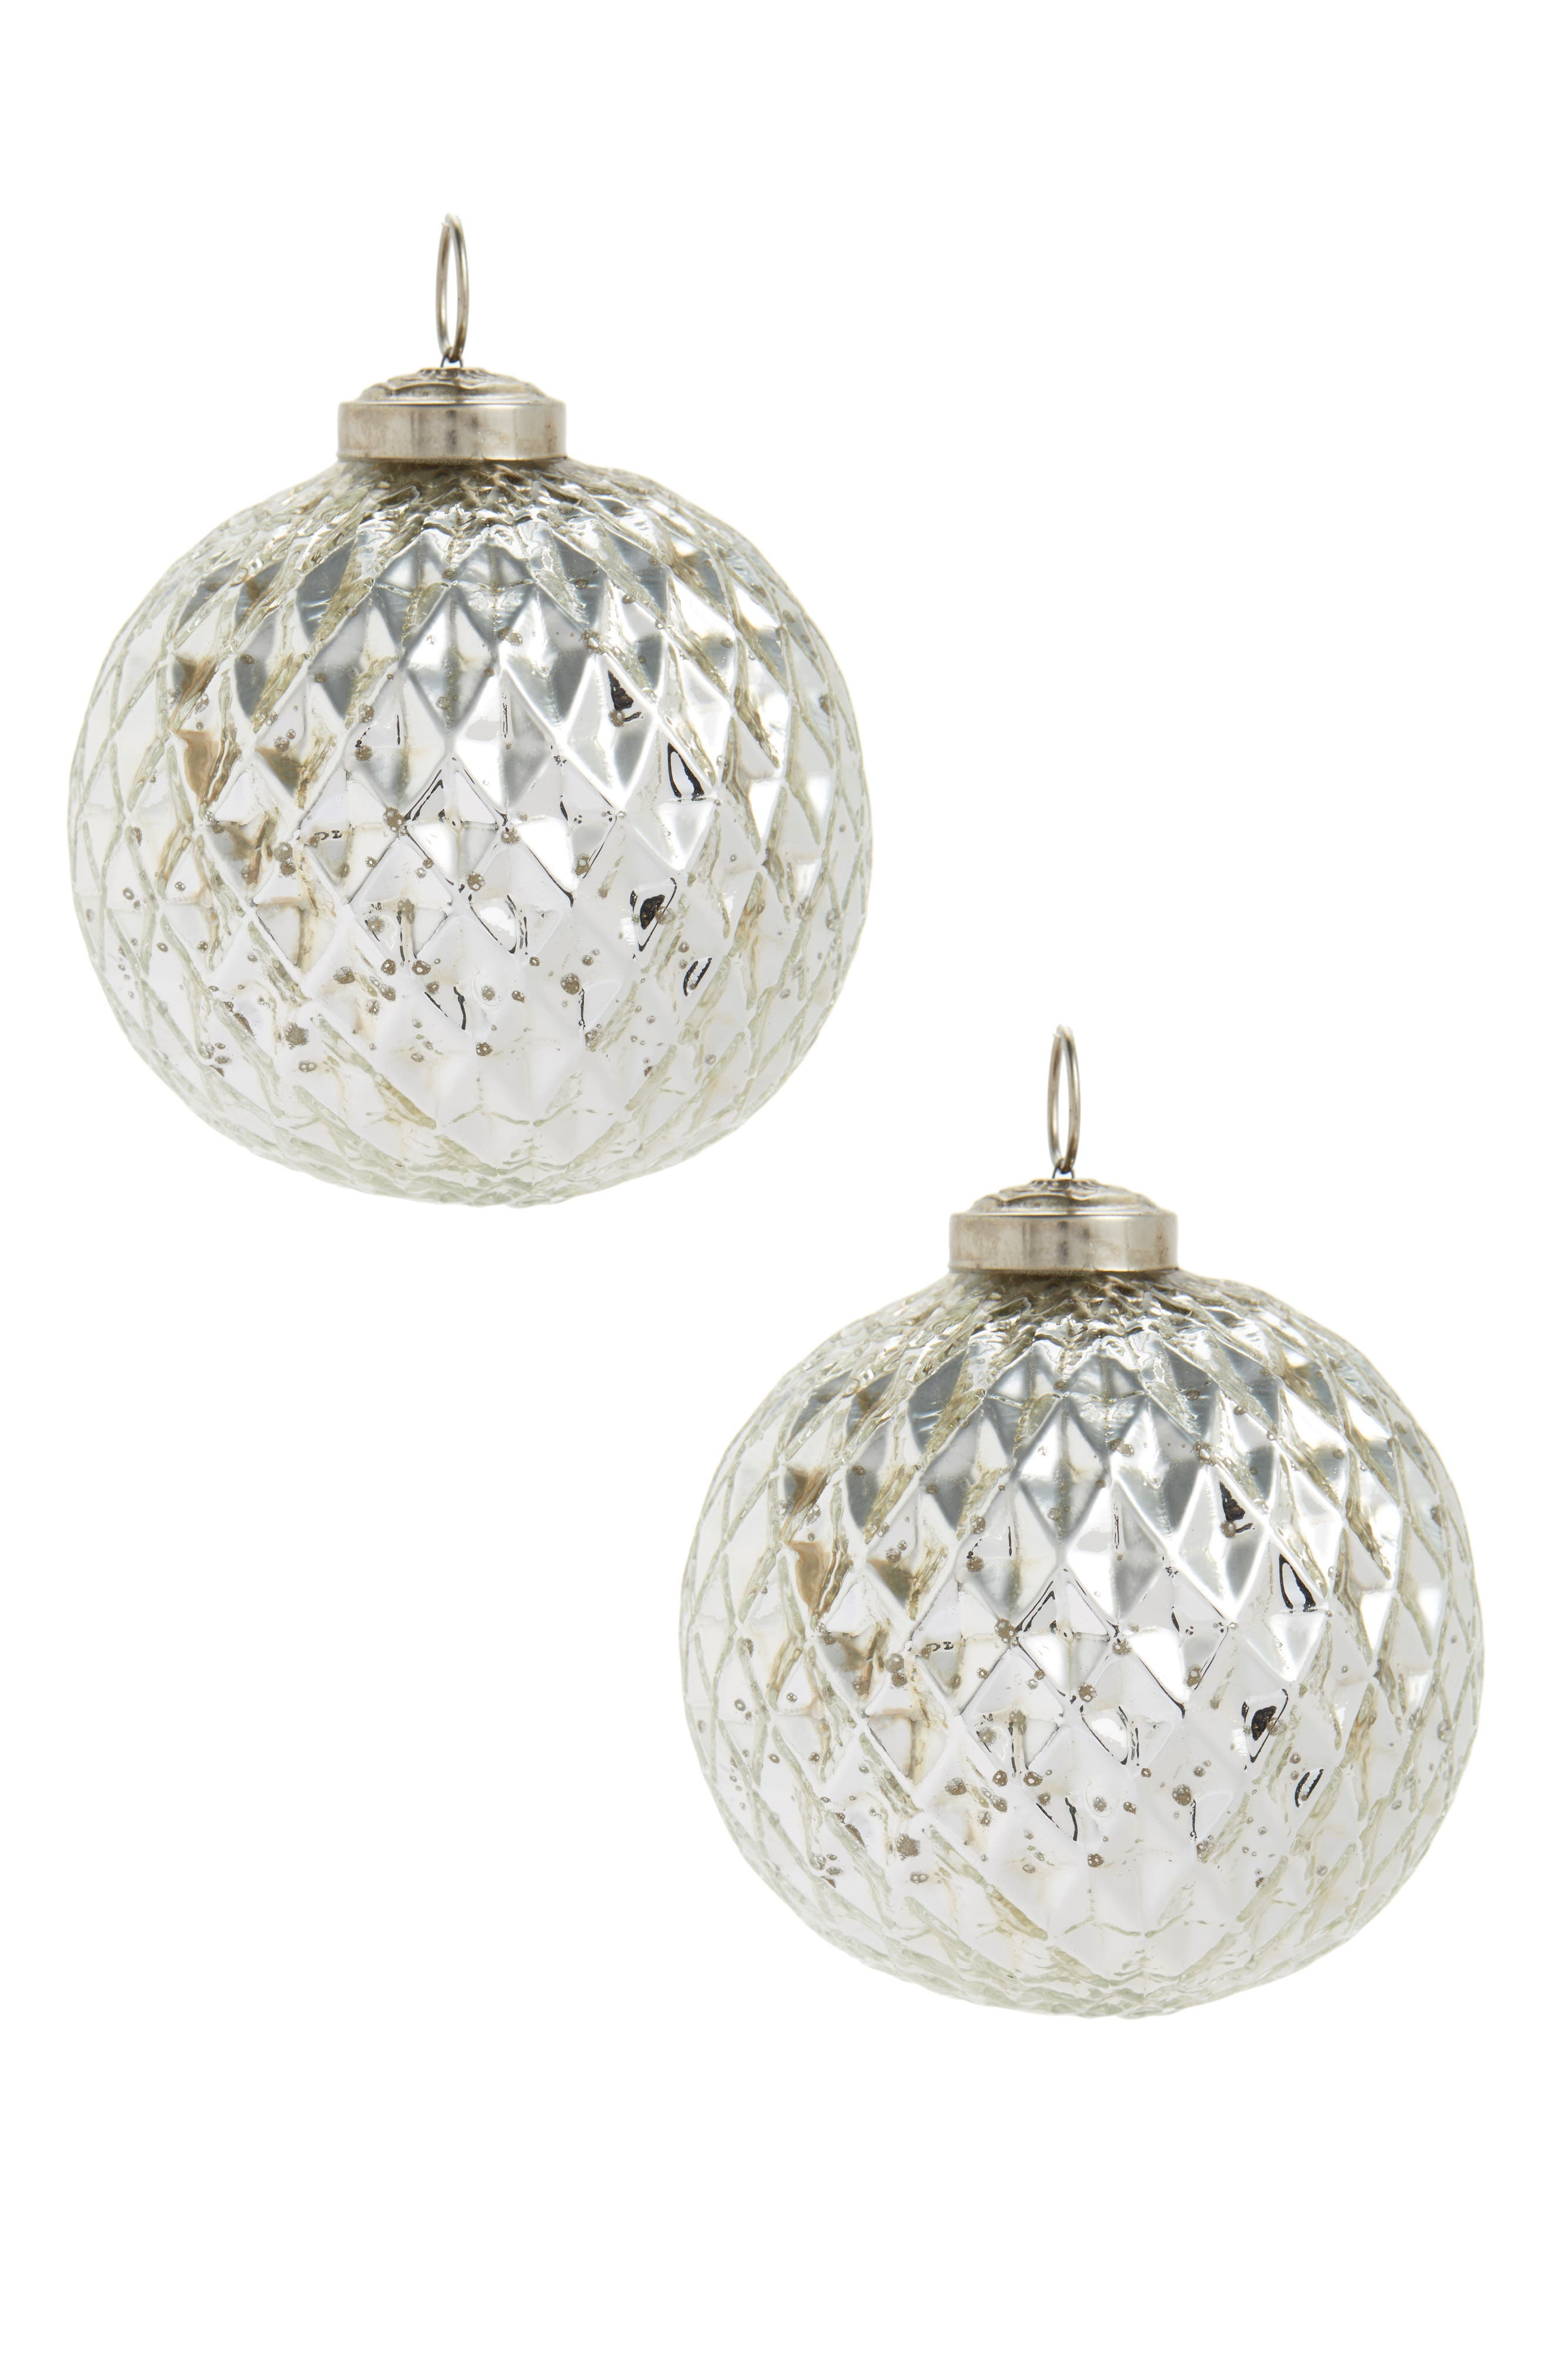 Arty Set of 2 Metallic Ball Ornaments